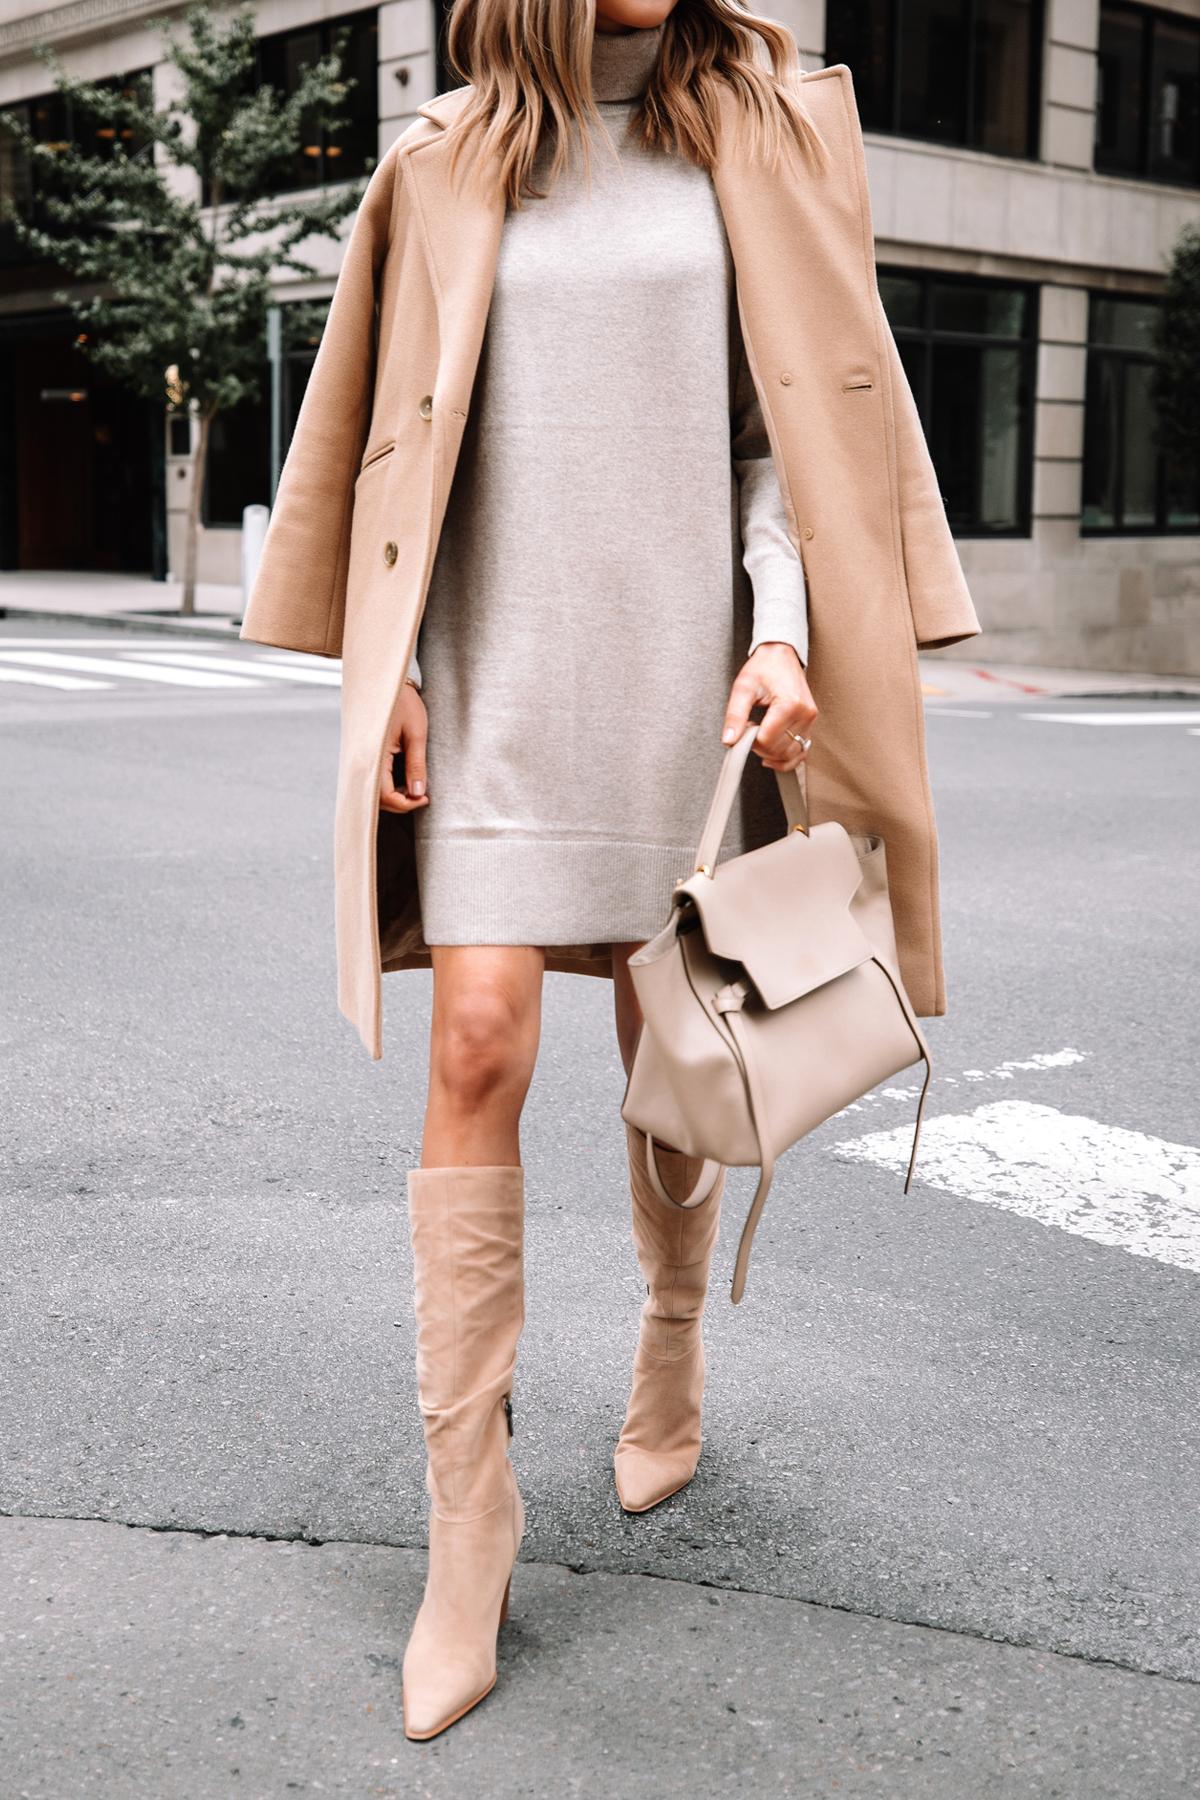 Fashion Jackson Wearing Everlane Camel Coat Everlane Beige Sweater Dress Tan Knee High Boots Celine Belt Bag Fall Outfit